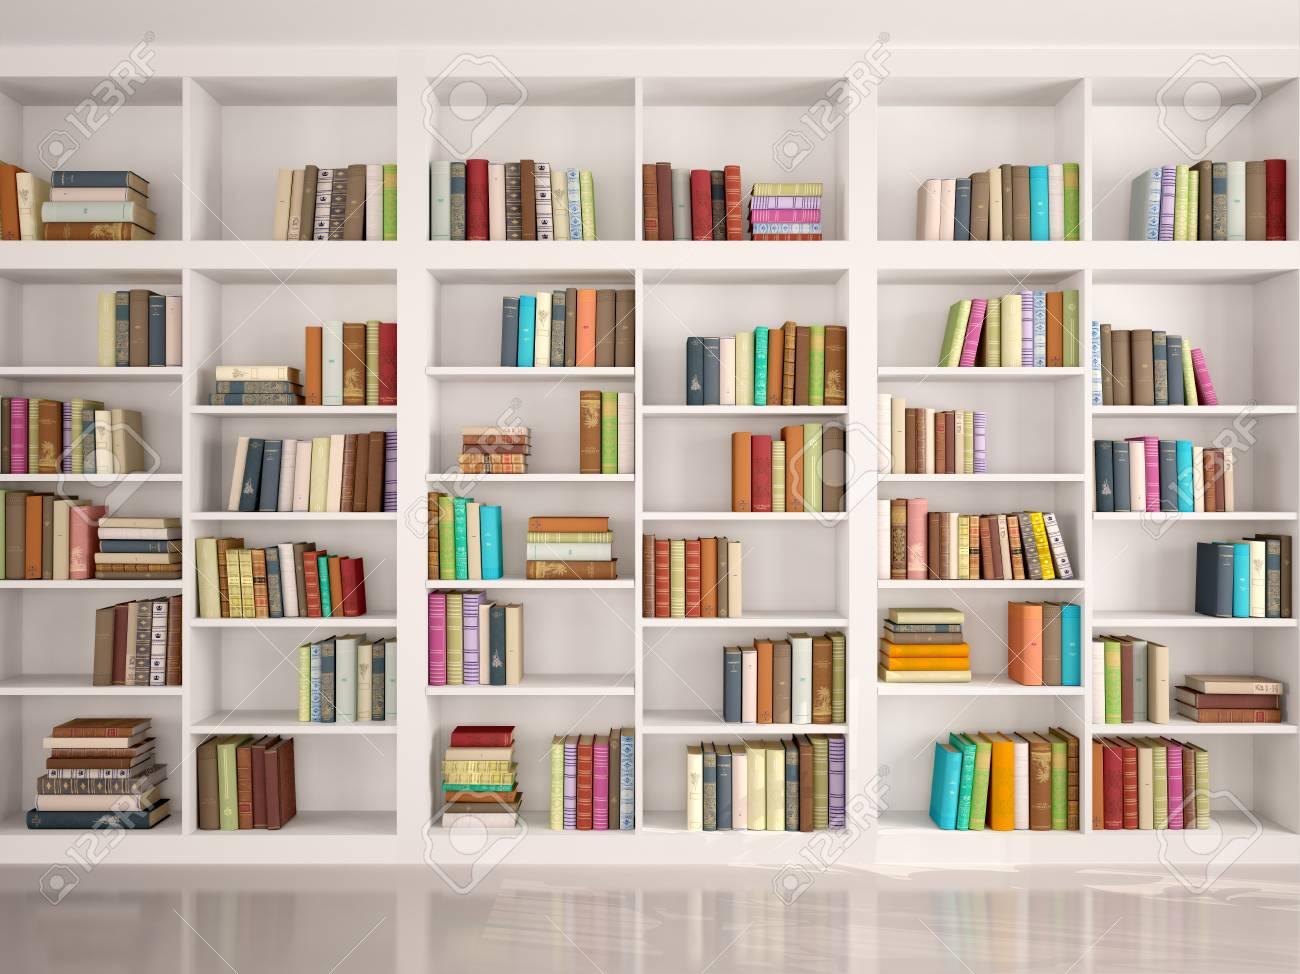 3d illustration of white bookshelves with various colorful books stock illustration 53058405